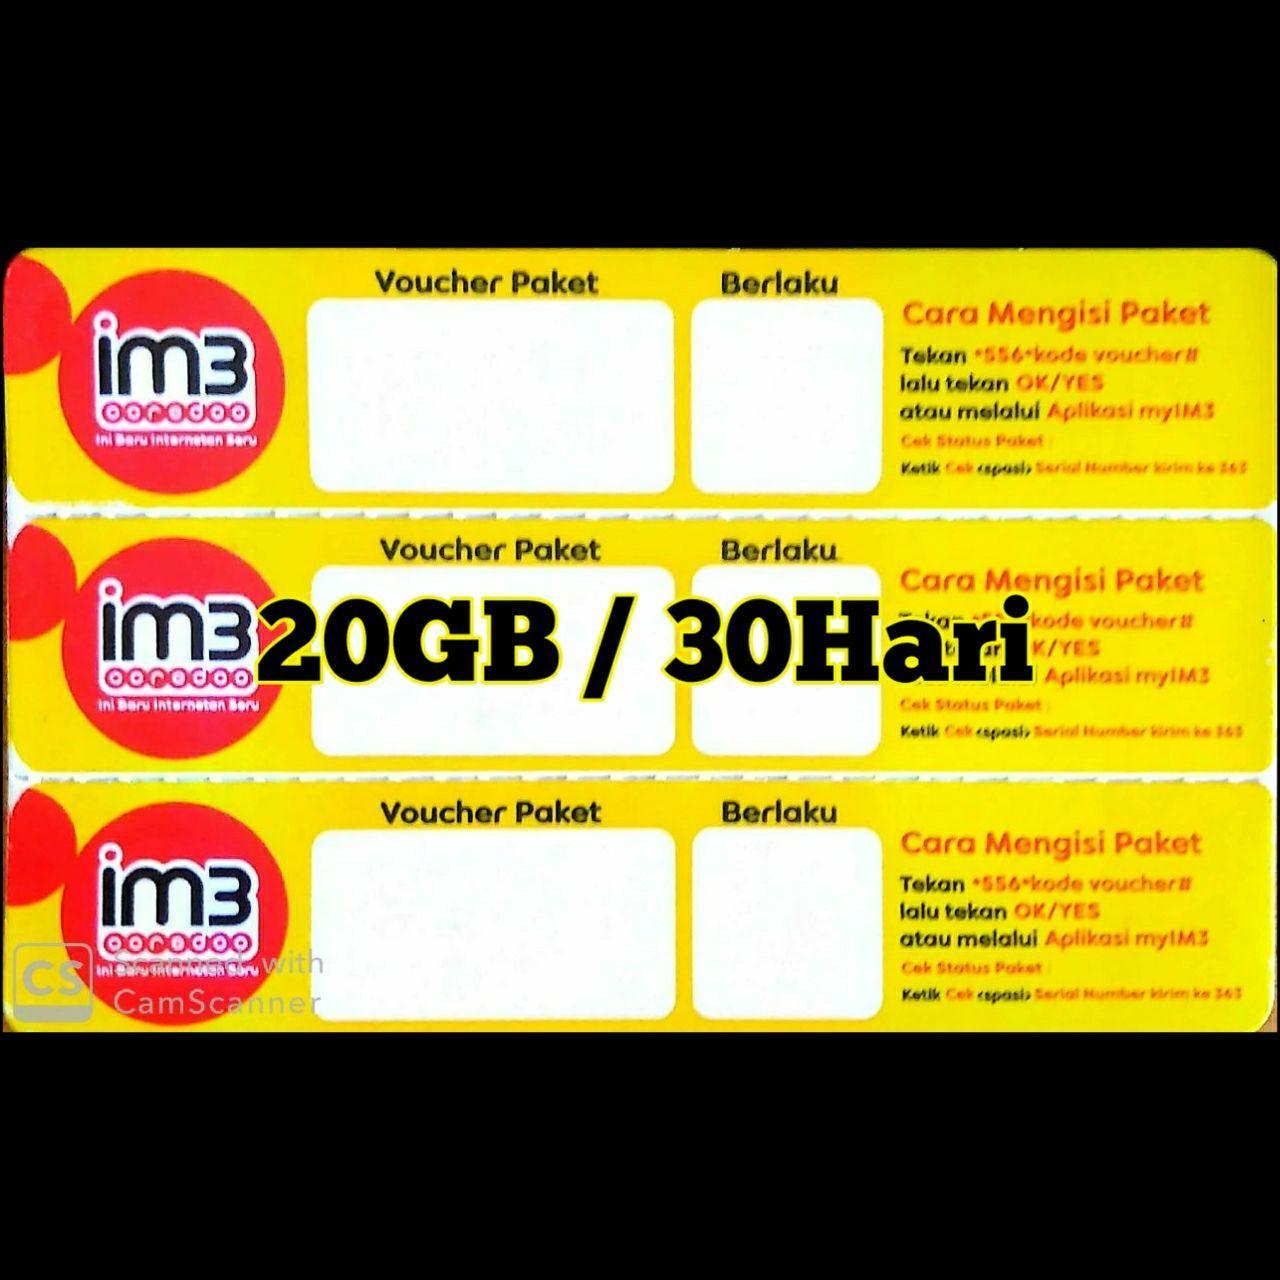 Data Im3 20GB/30HARI